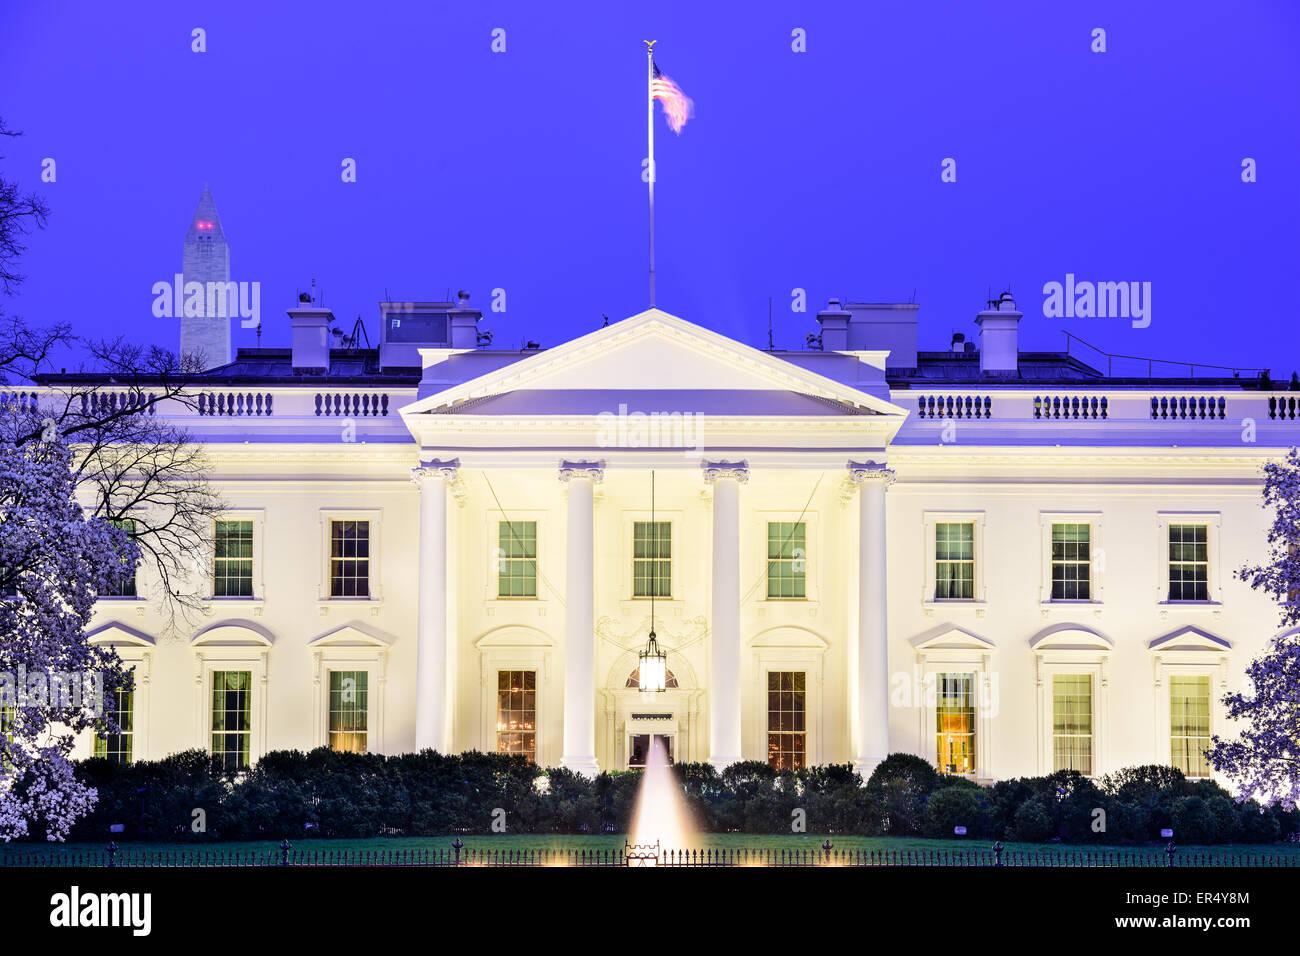 Washington, DC at the White House. - Stock Image